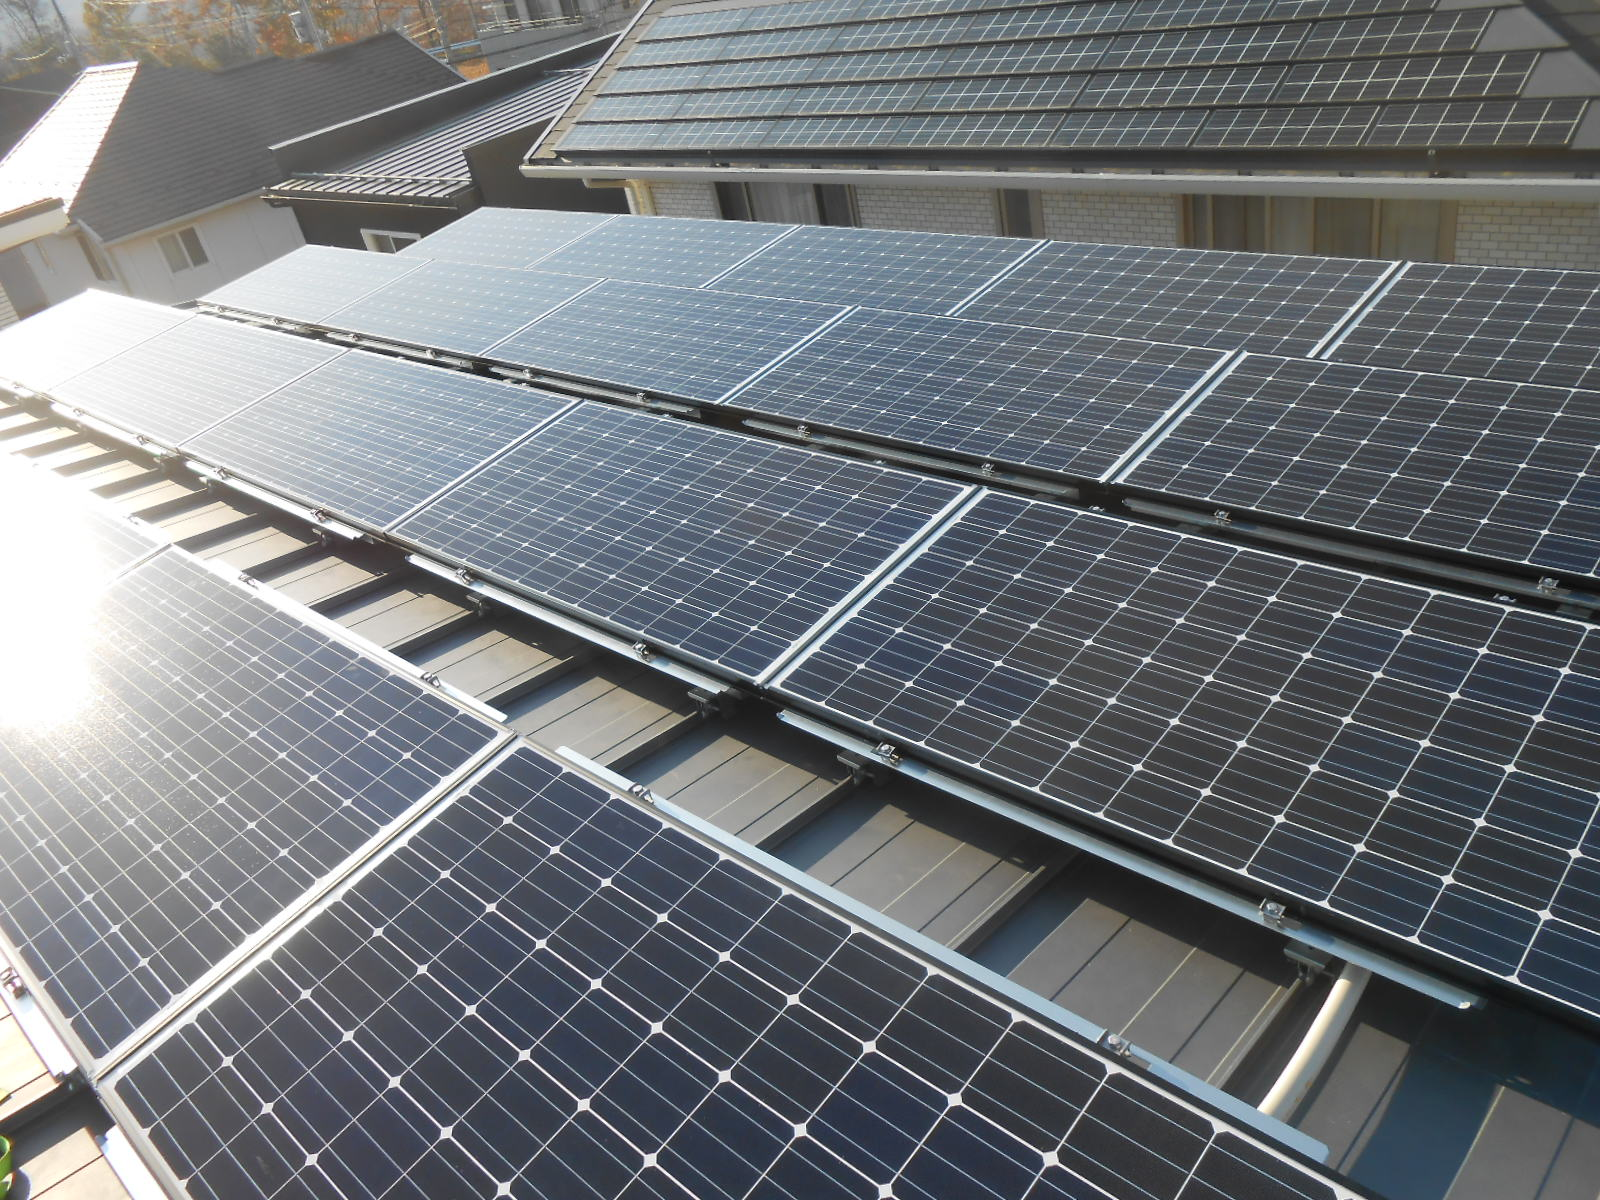 MMFの電気工事例、太陽光パネル、太陽光システム工事